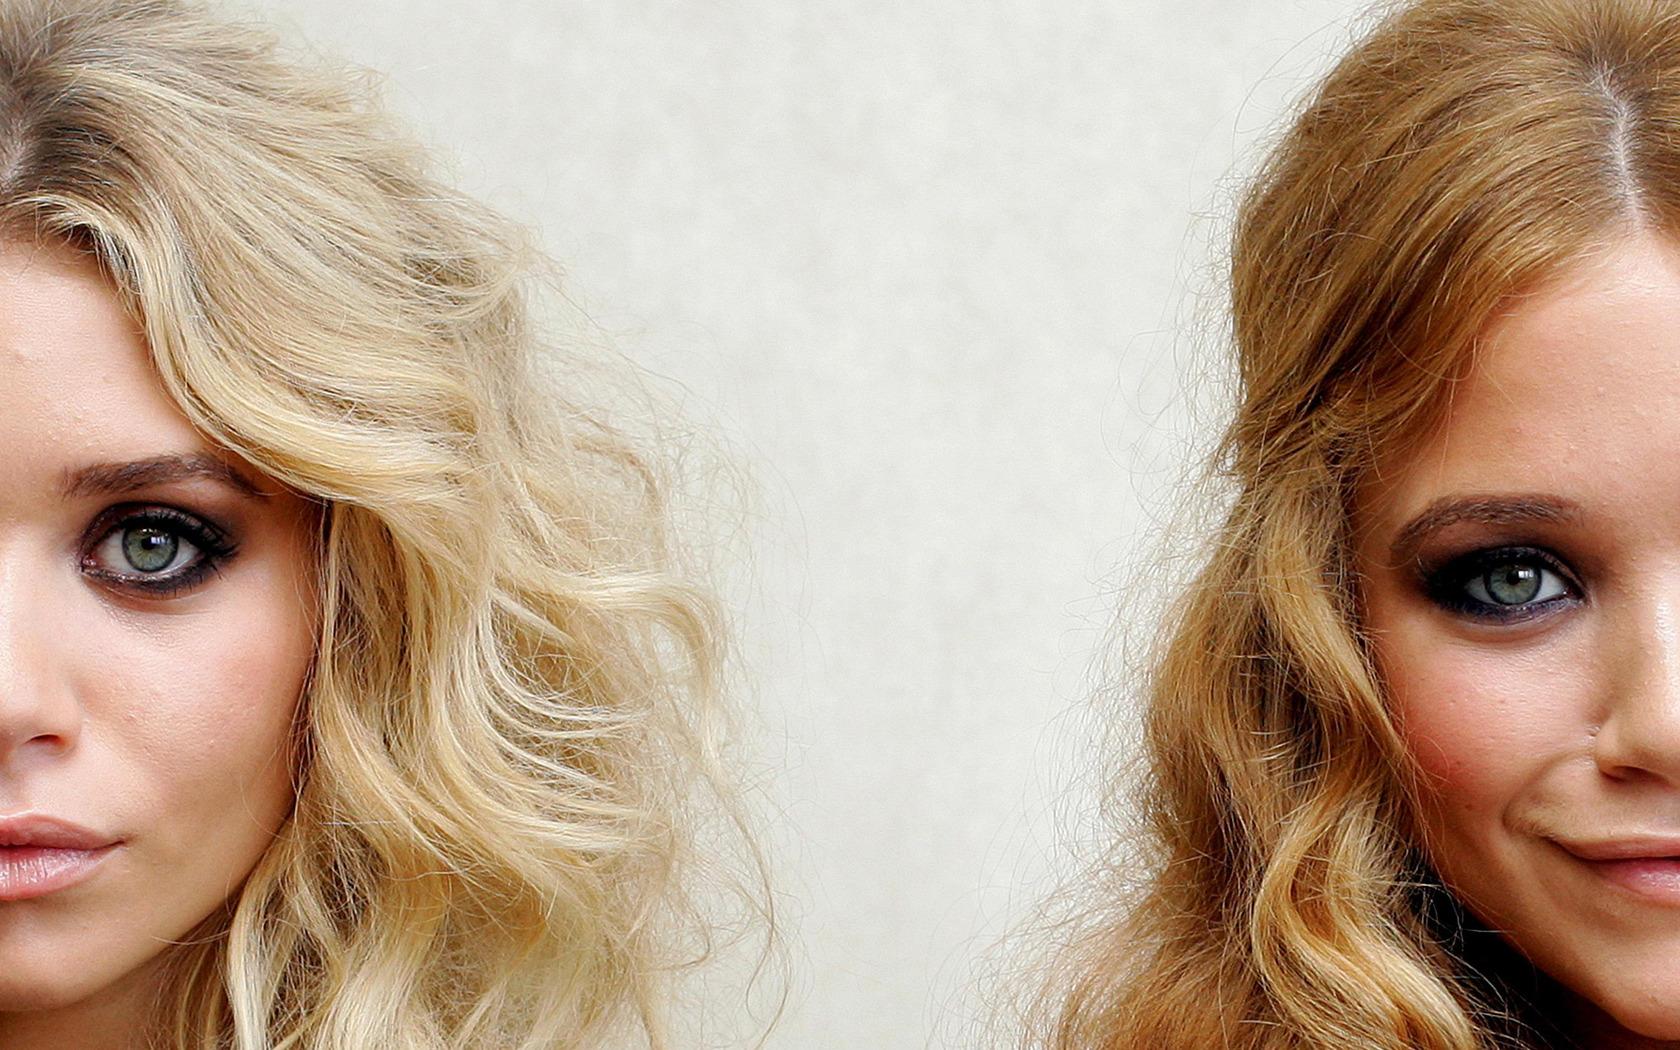 Olsen twins wallpaper 32533 1680x1050